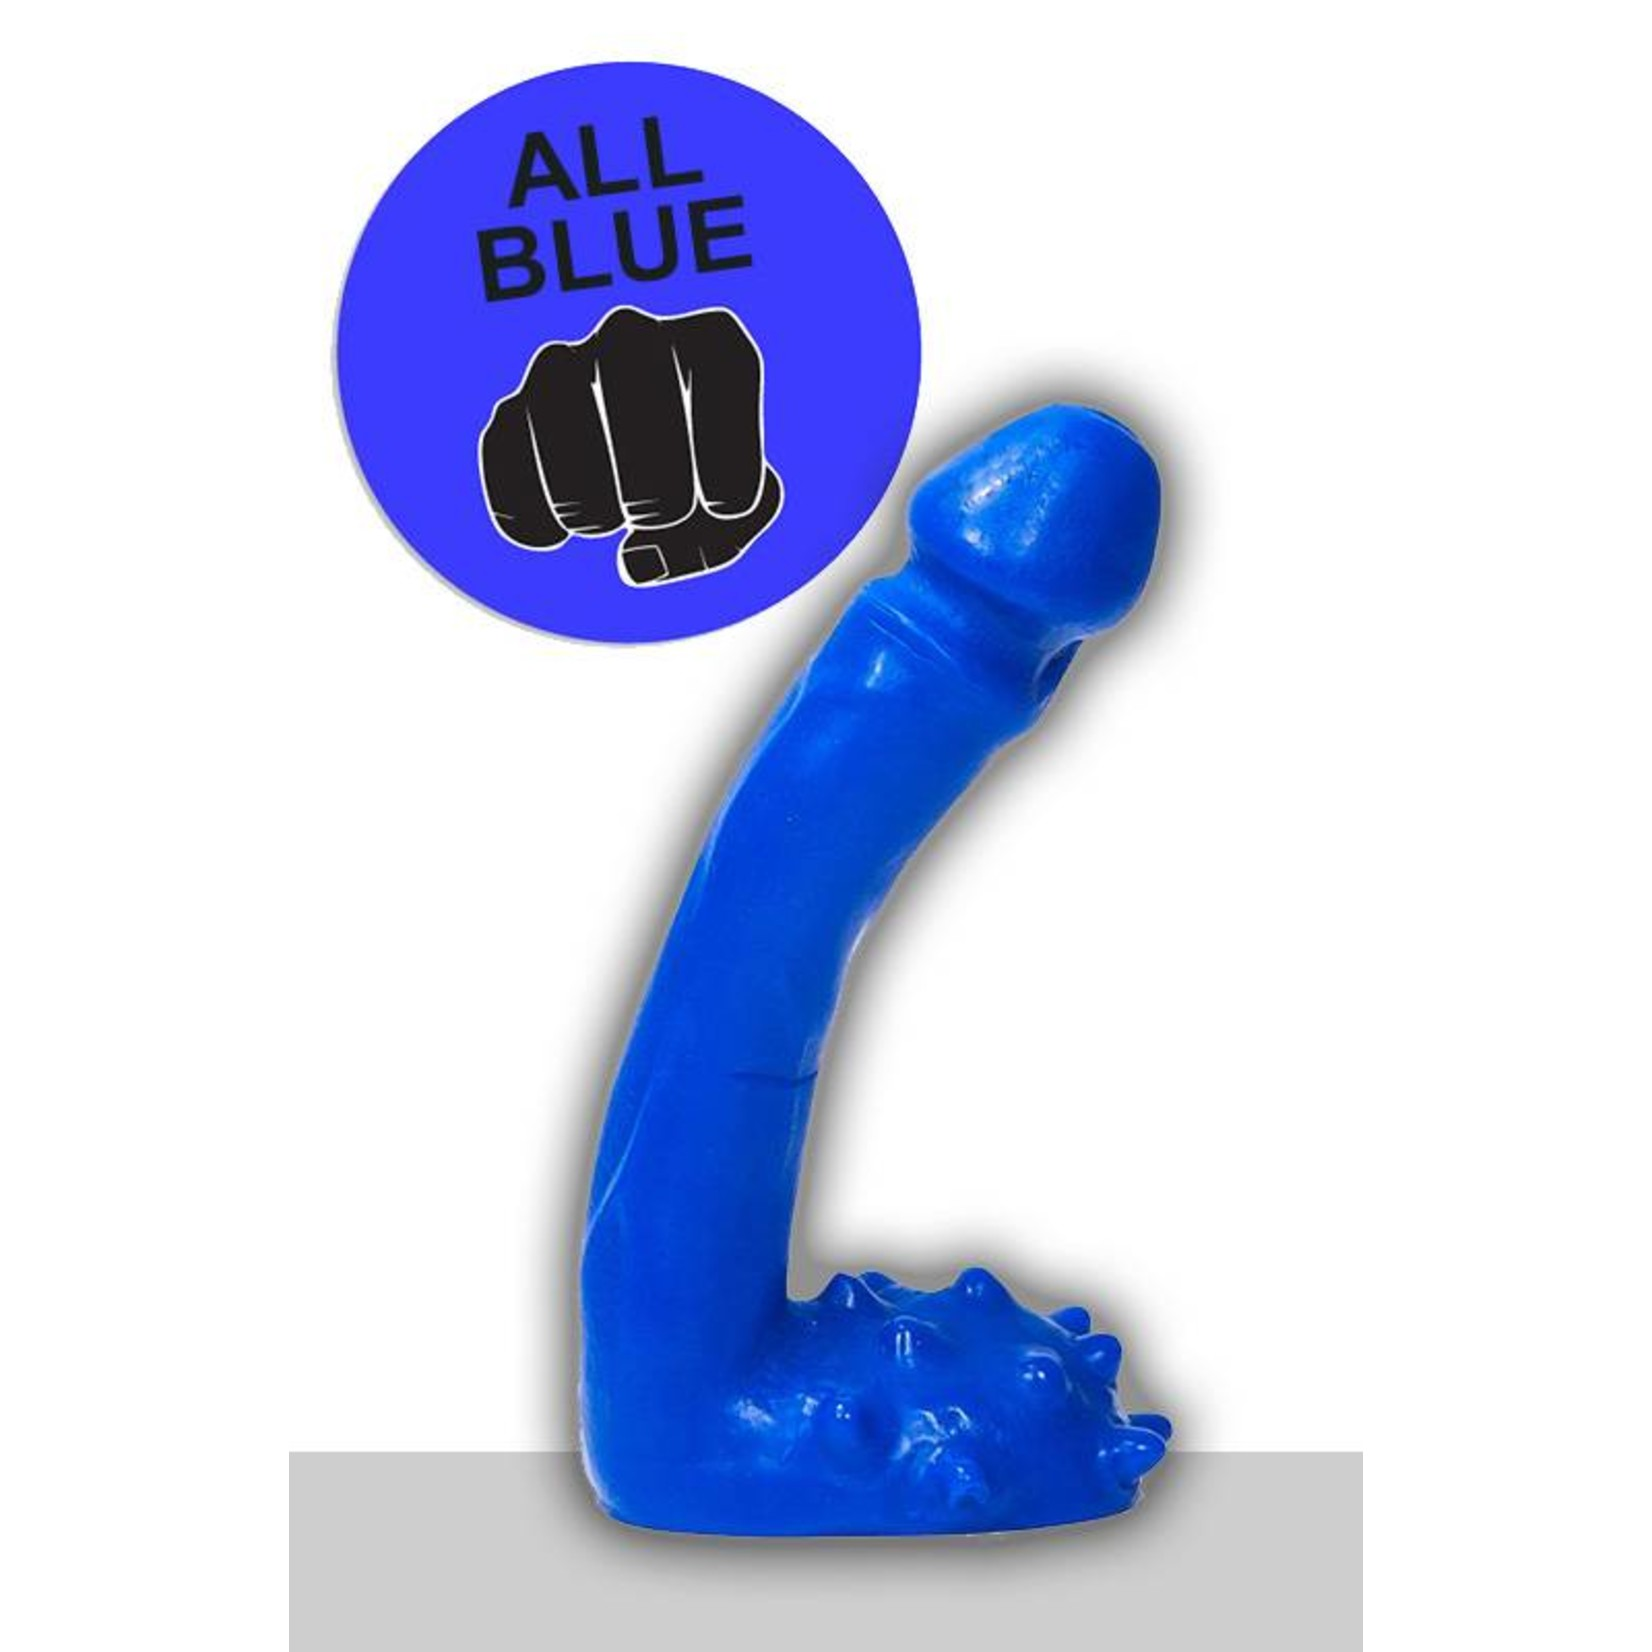 All Black All Blue Dildo - ABB 26